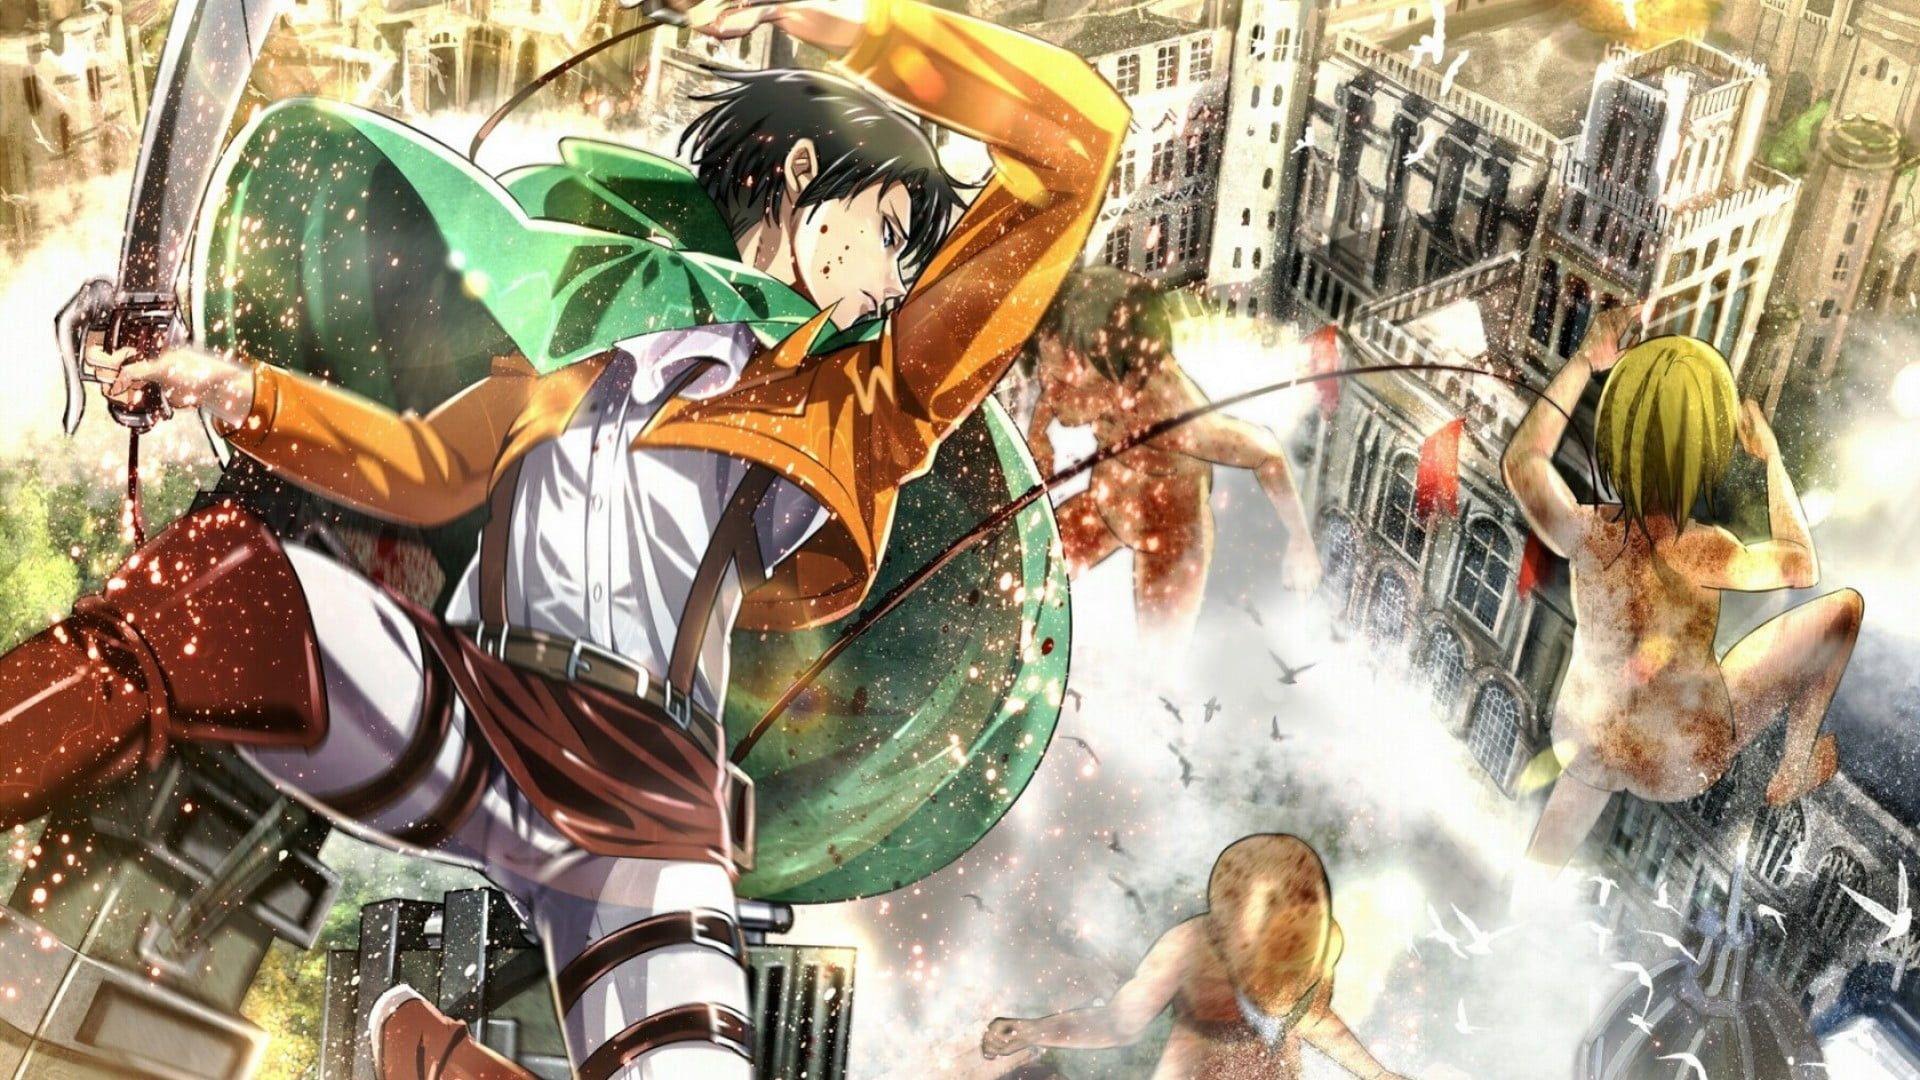 Attack On Titan Wallpaper 4k Desktop Lovely Hd Wallpaper Anime Attack Titan Levi Ackerman Of Anime Attack On Titan Attack On Titan Art